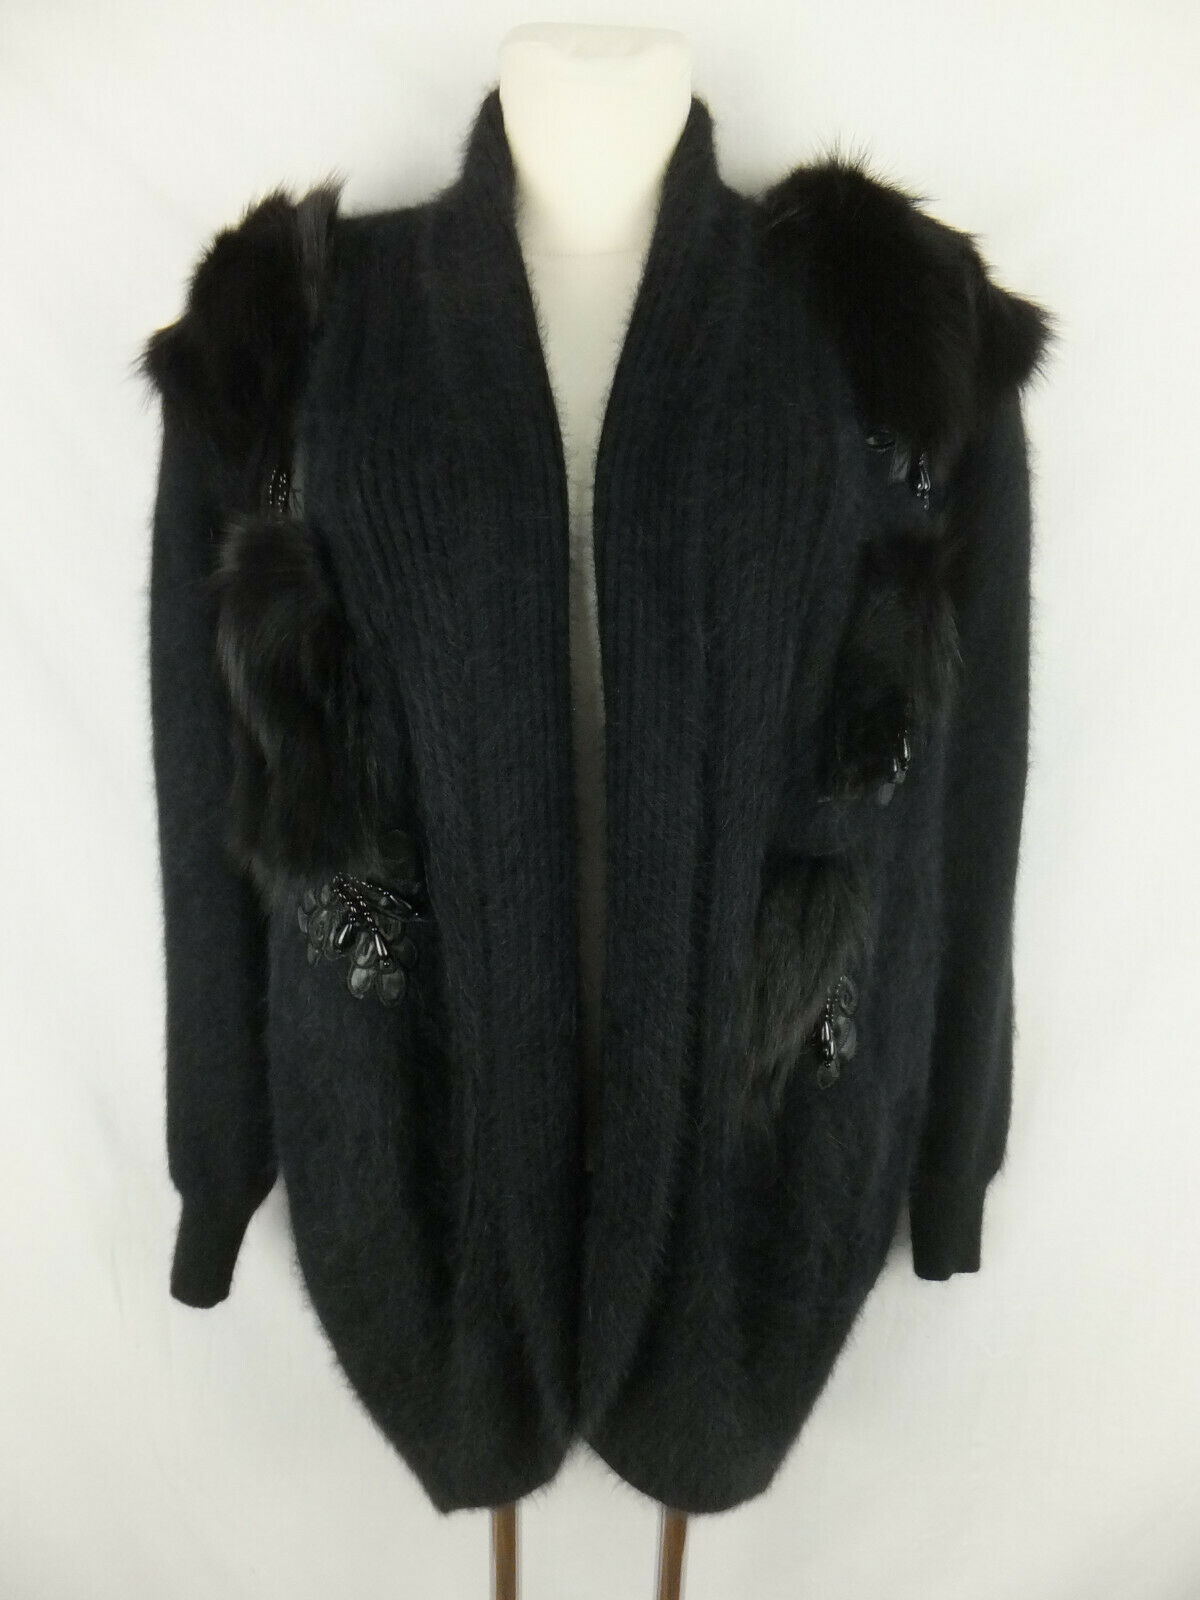 Upper Class Vintage Cardigan M. Angora and Wool 42/44 Black echpelz Stocking-show original title